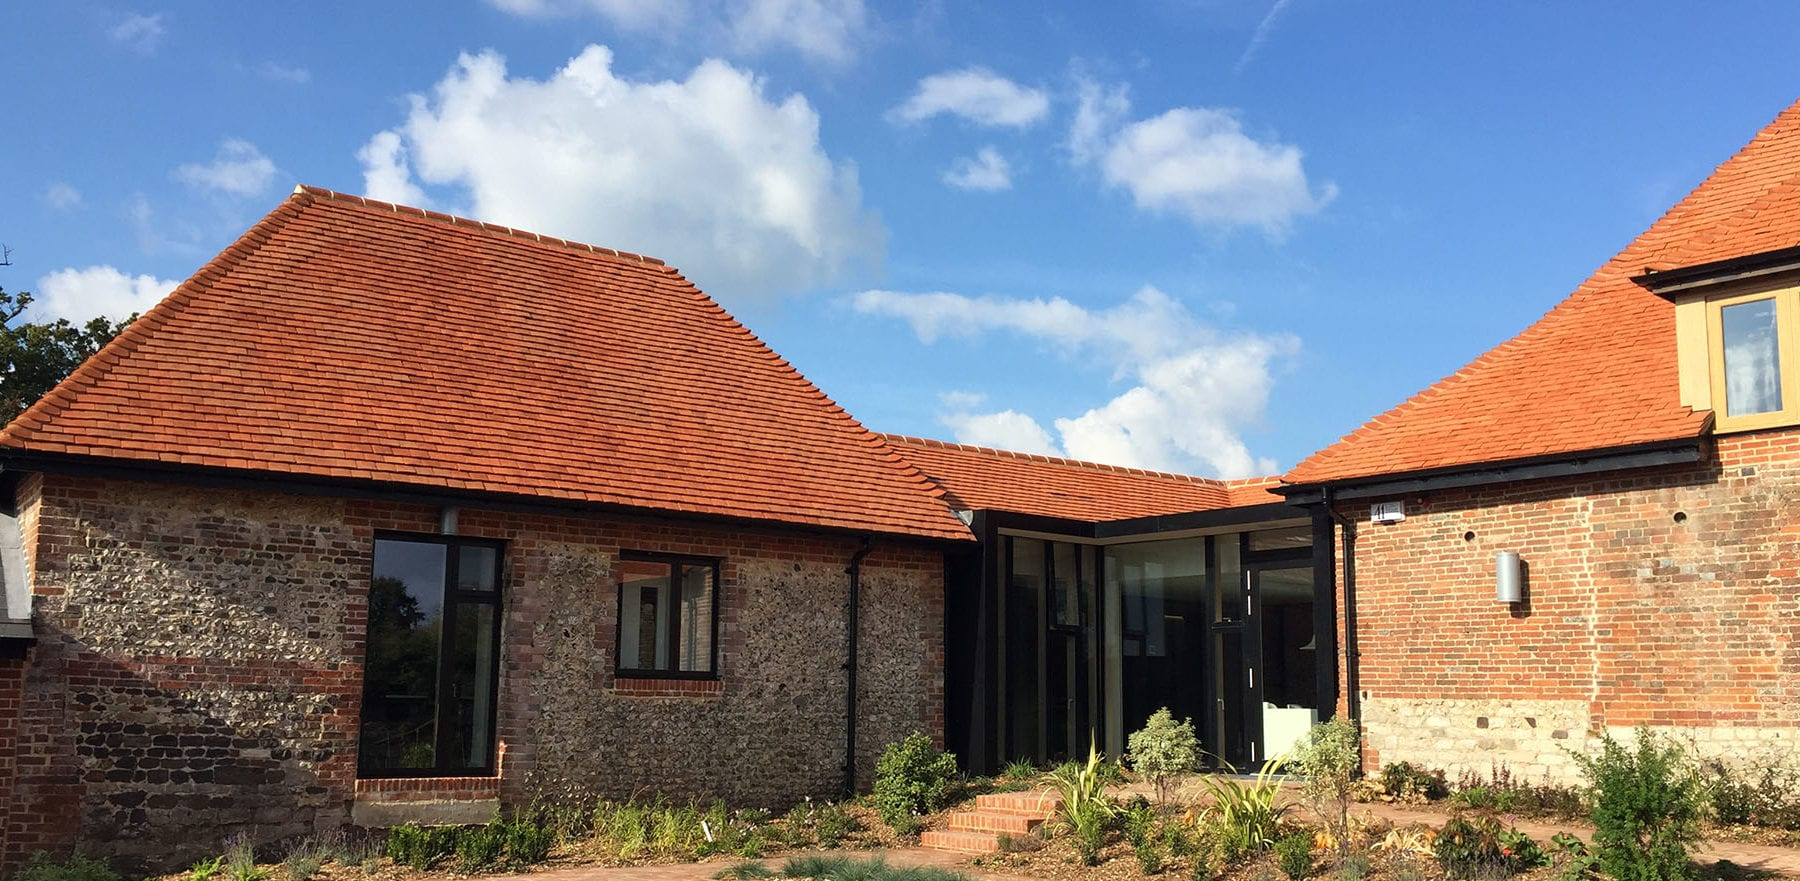 Lifestiles - Handcrafted Pentlow Clay Roof Tiles - Petersfield, England 3